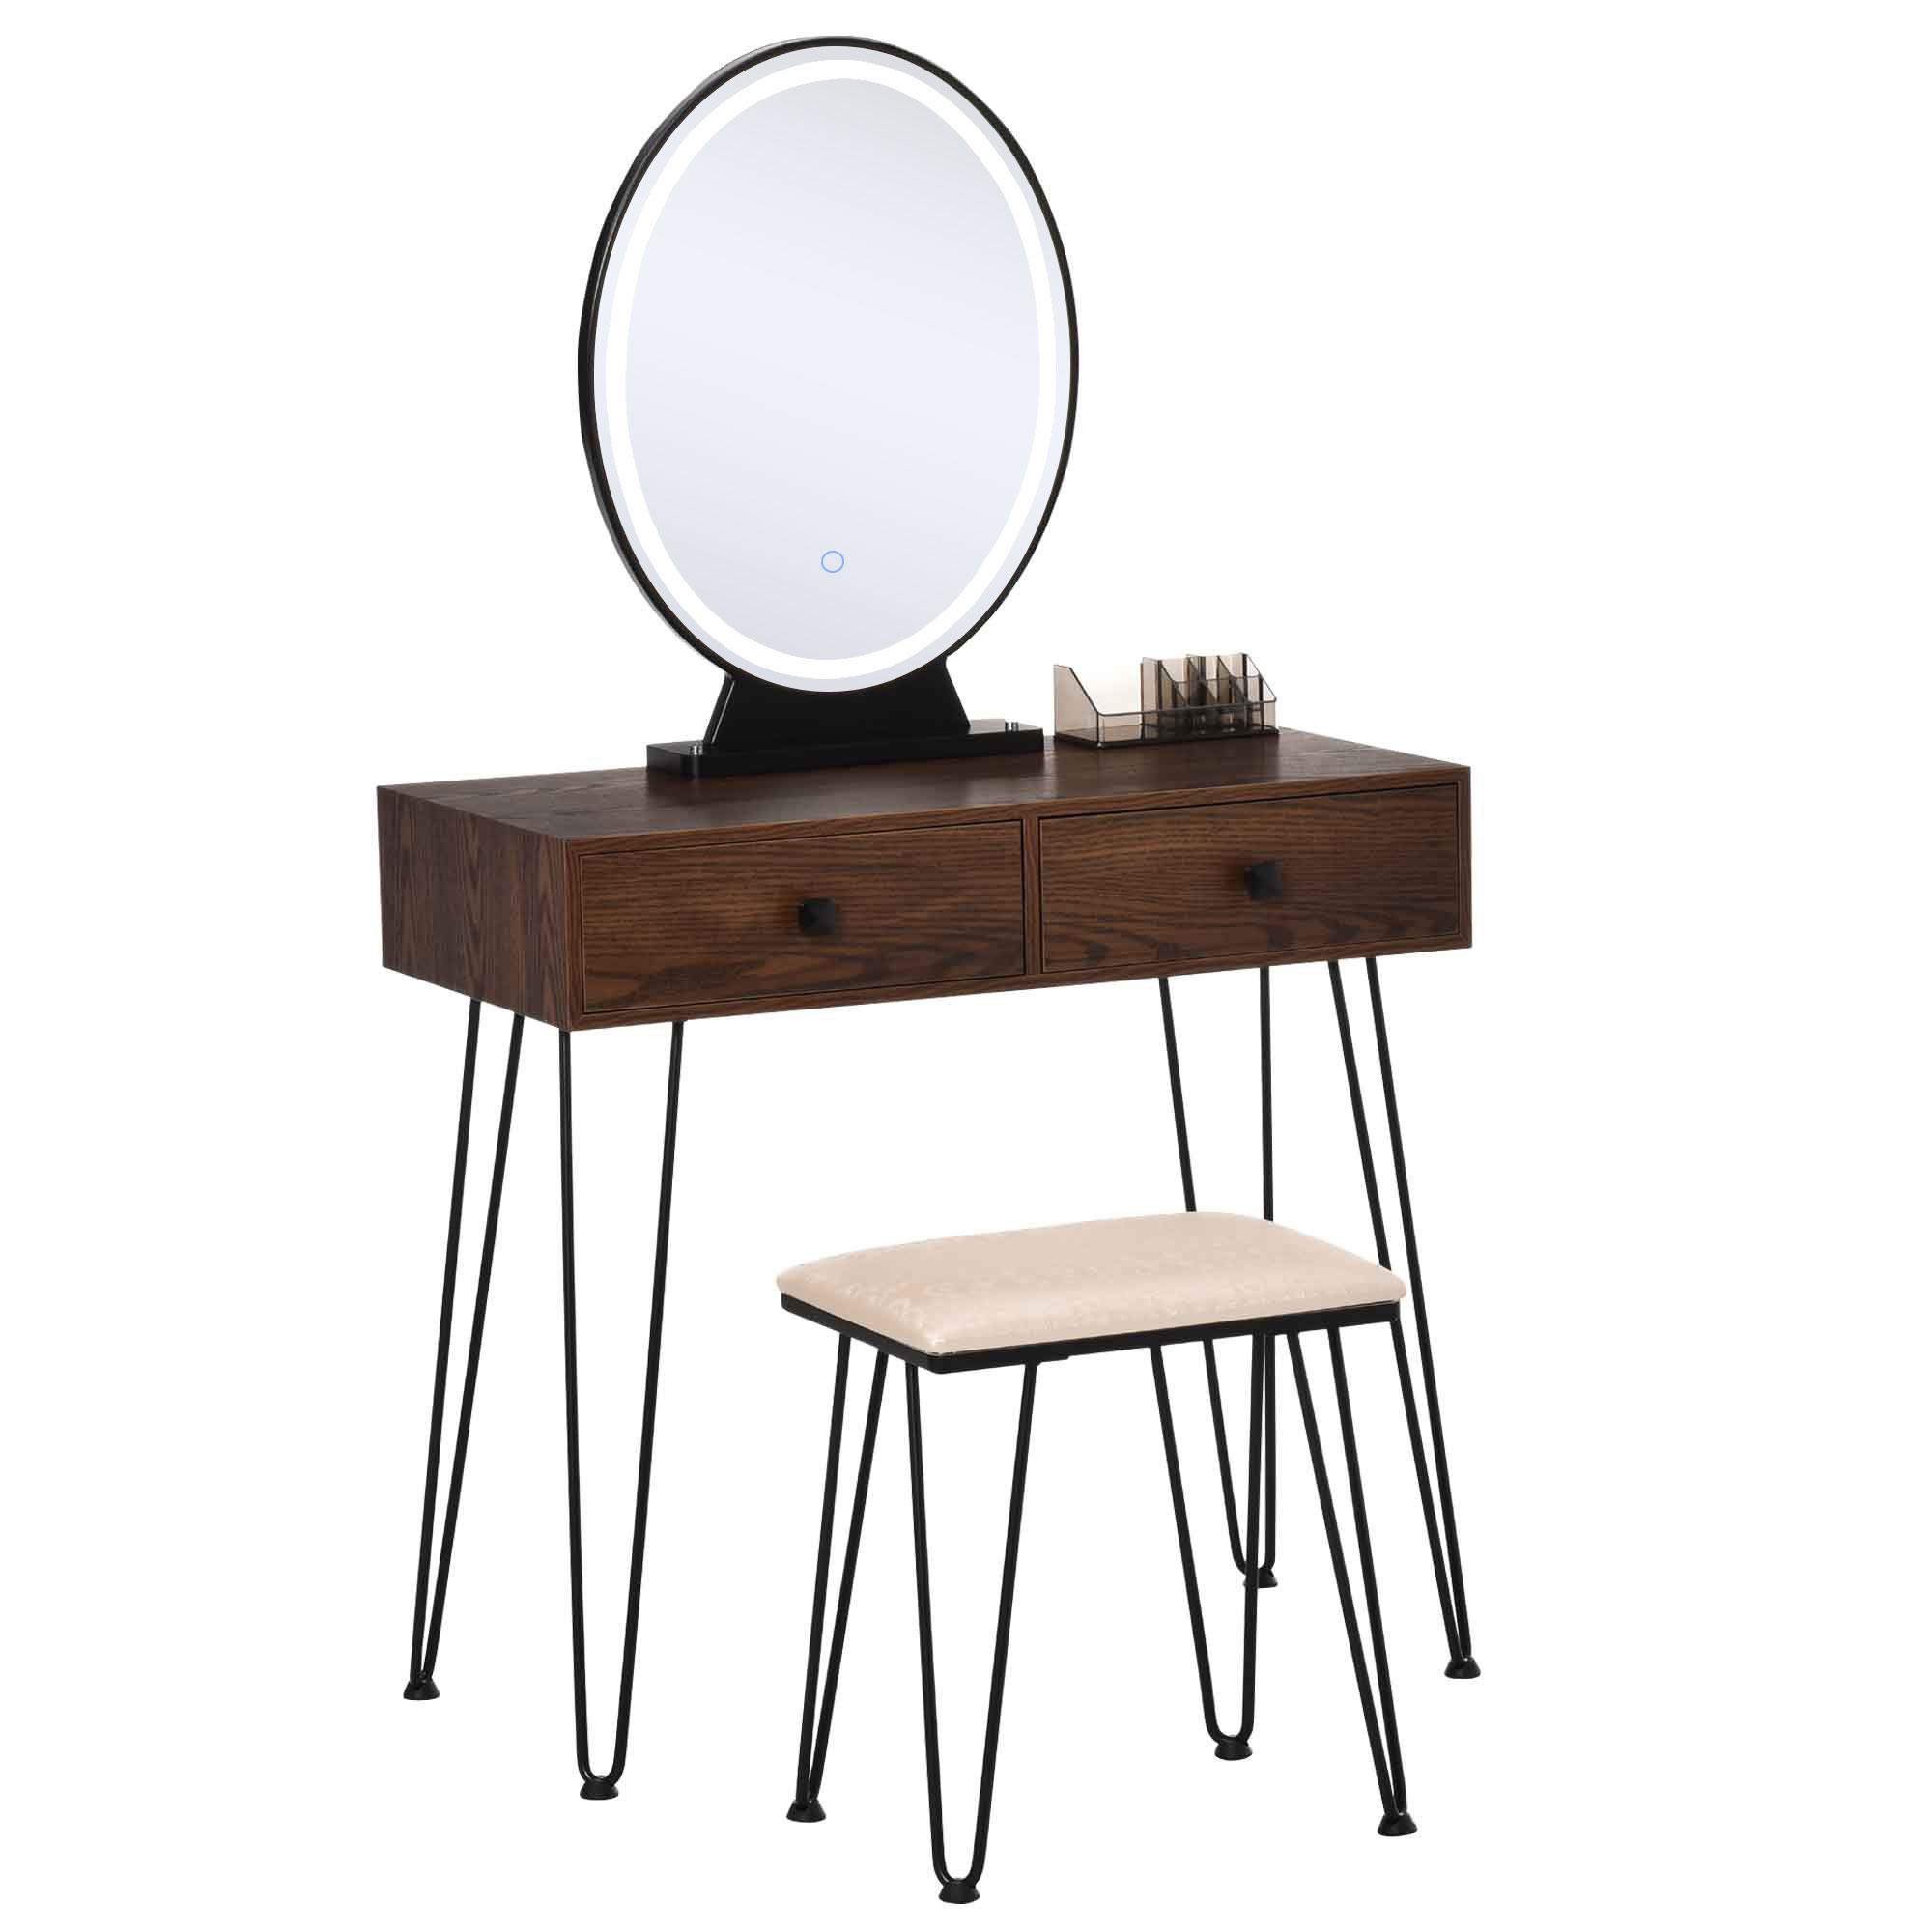 Coiffeuse design 2 tiroirs organisateur miroir LED tabouret inclus